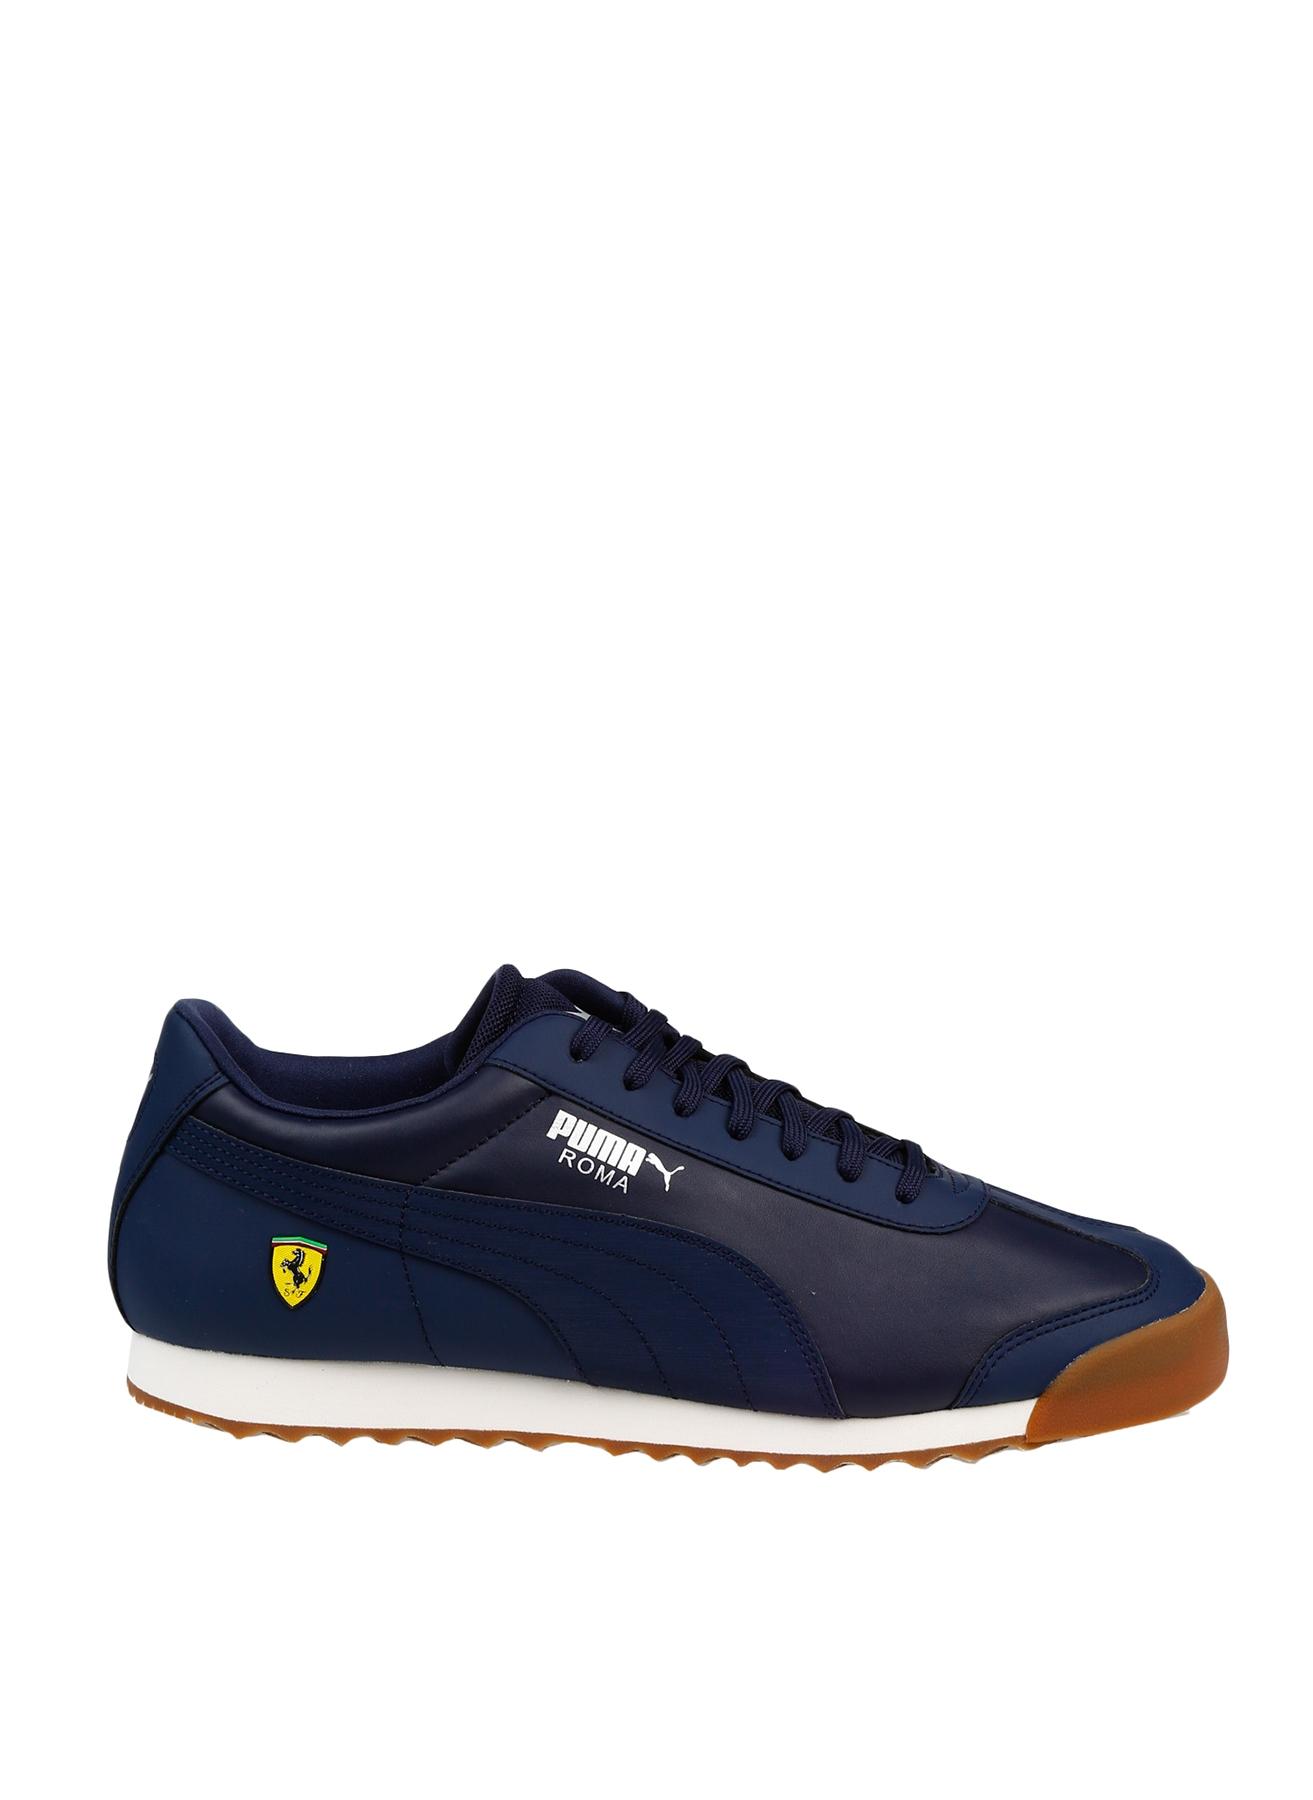 Puma SF Roma Lifestyle Ayakkabı 42.5 5001632592005 Ürün Resmi